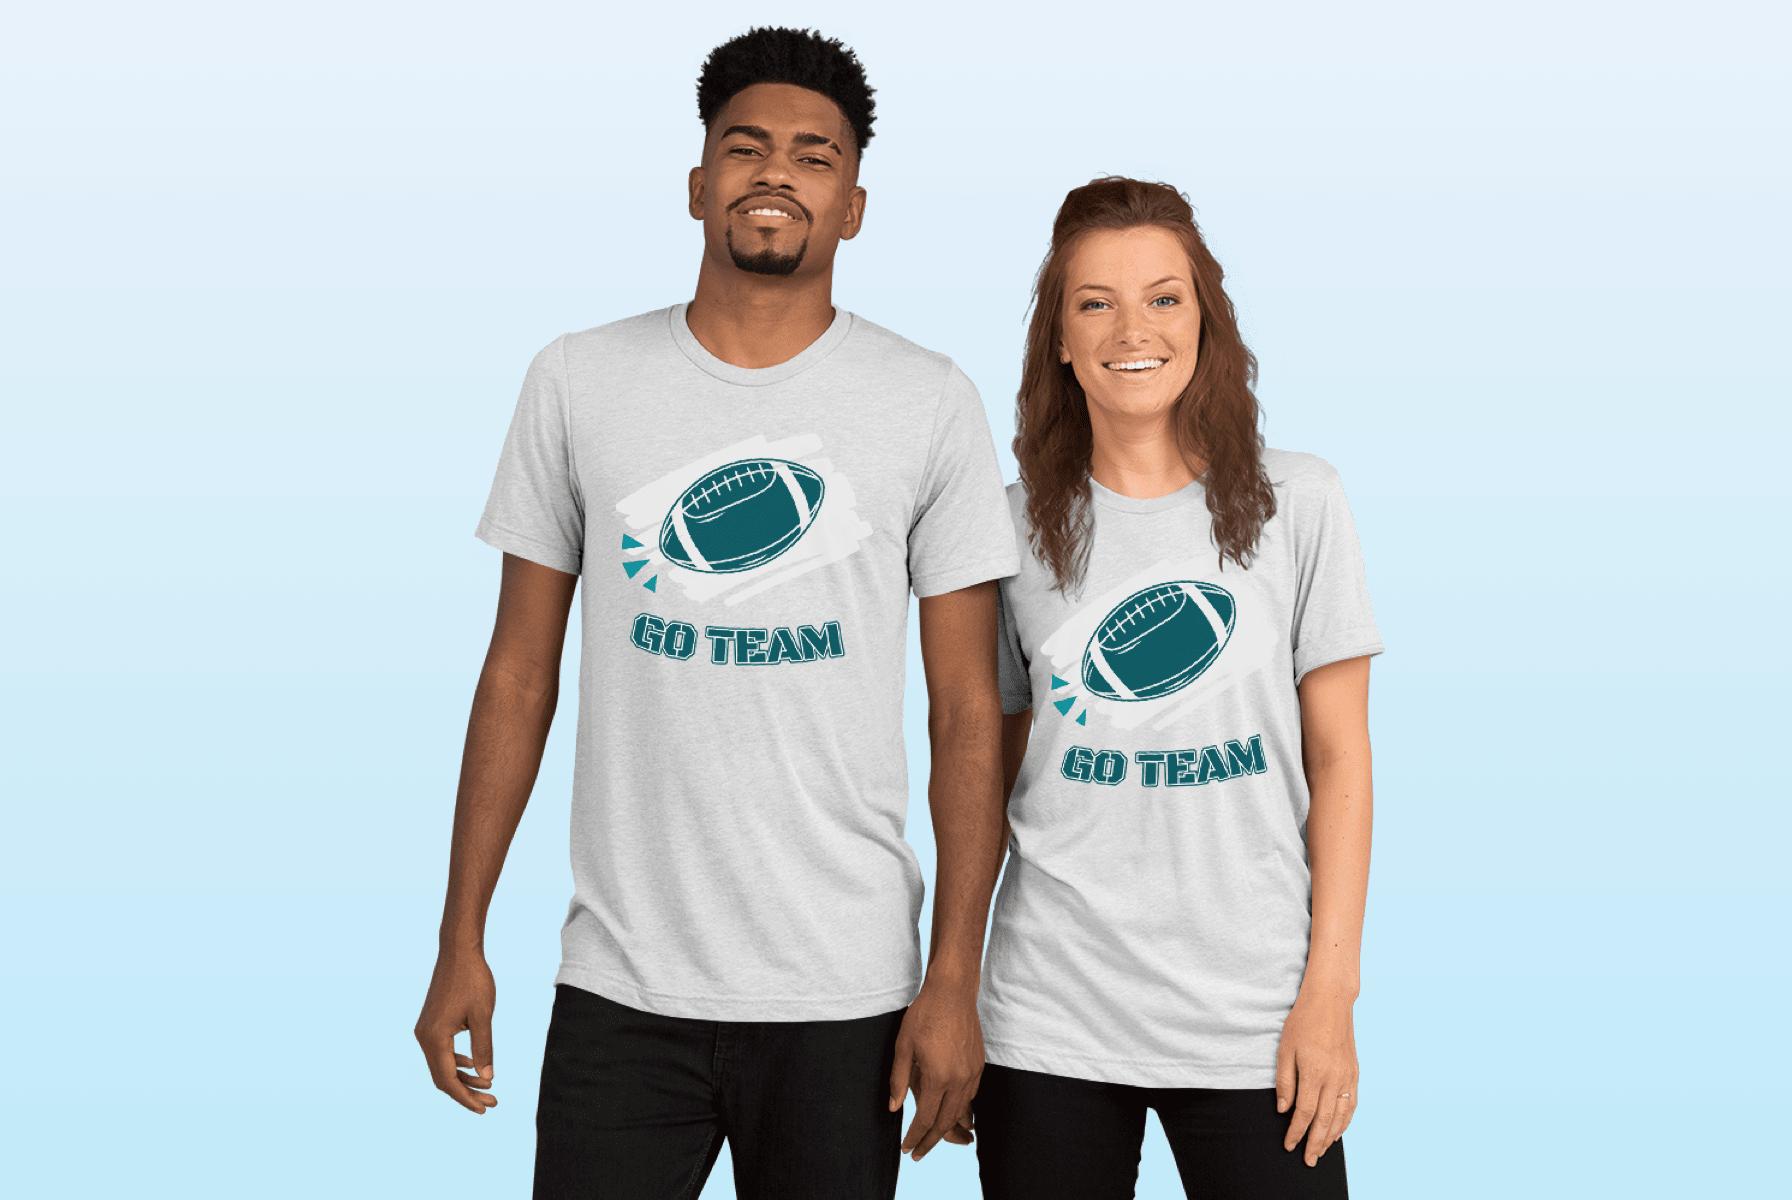 student team shirts